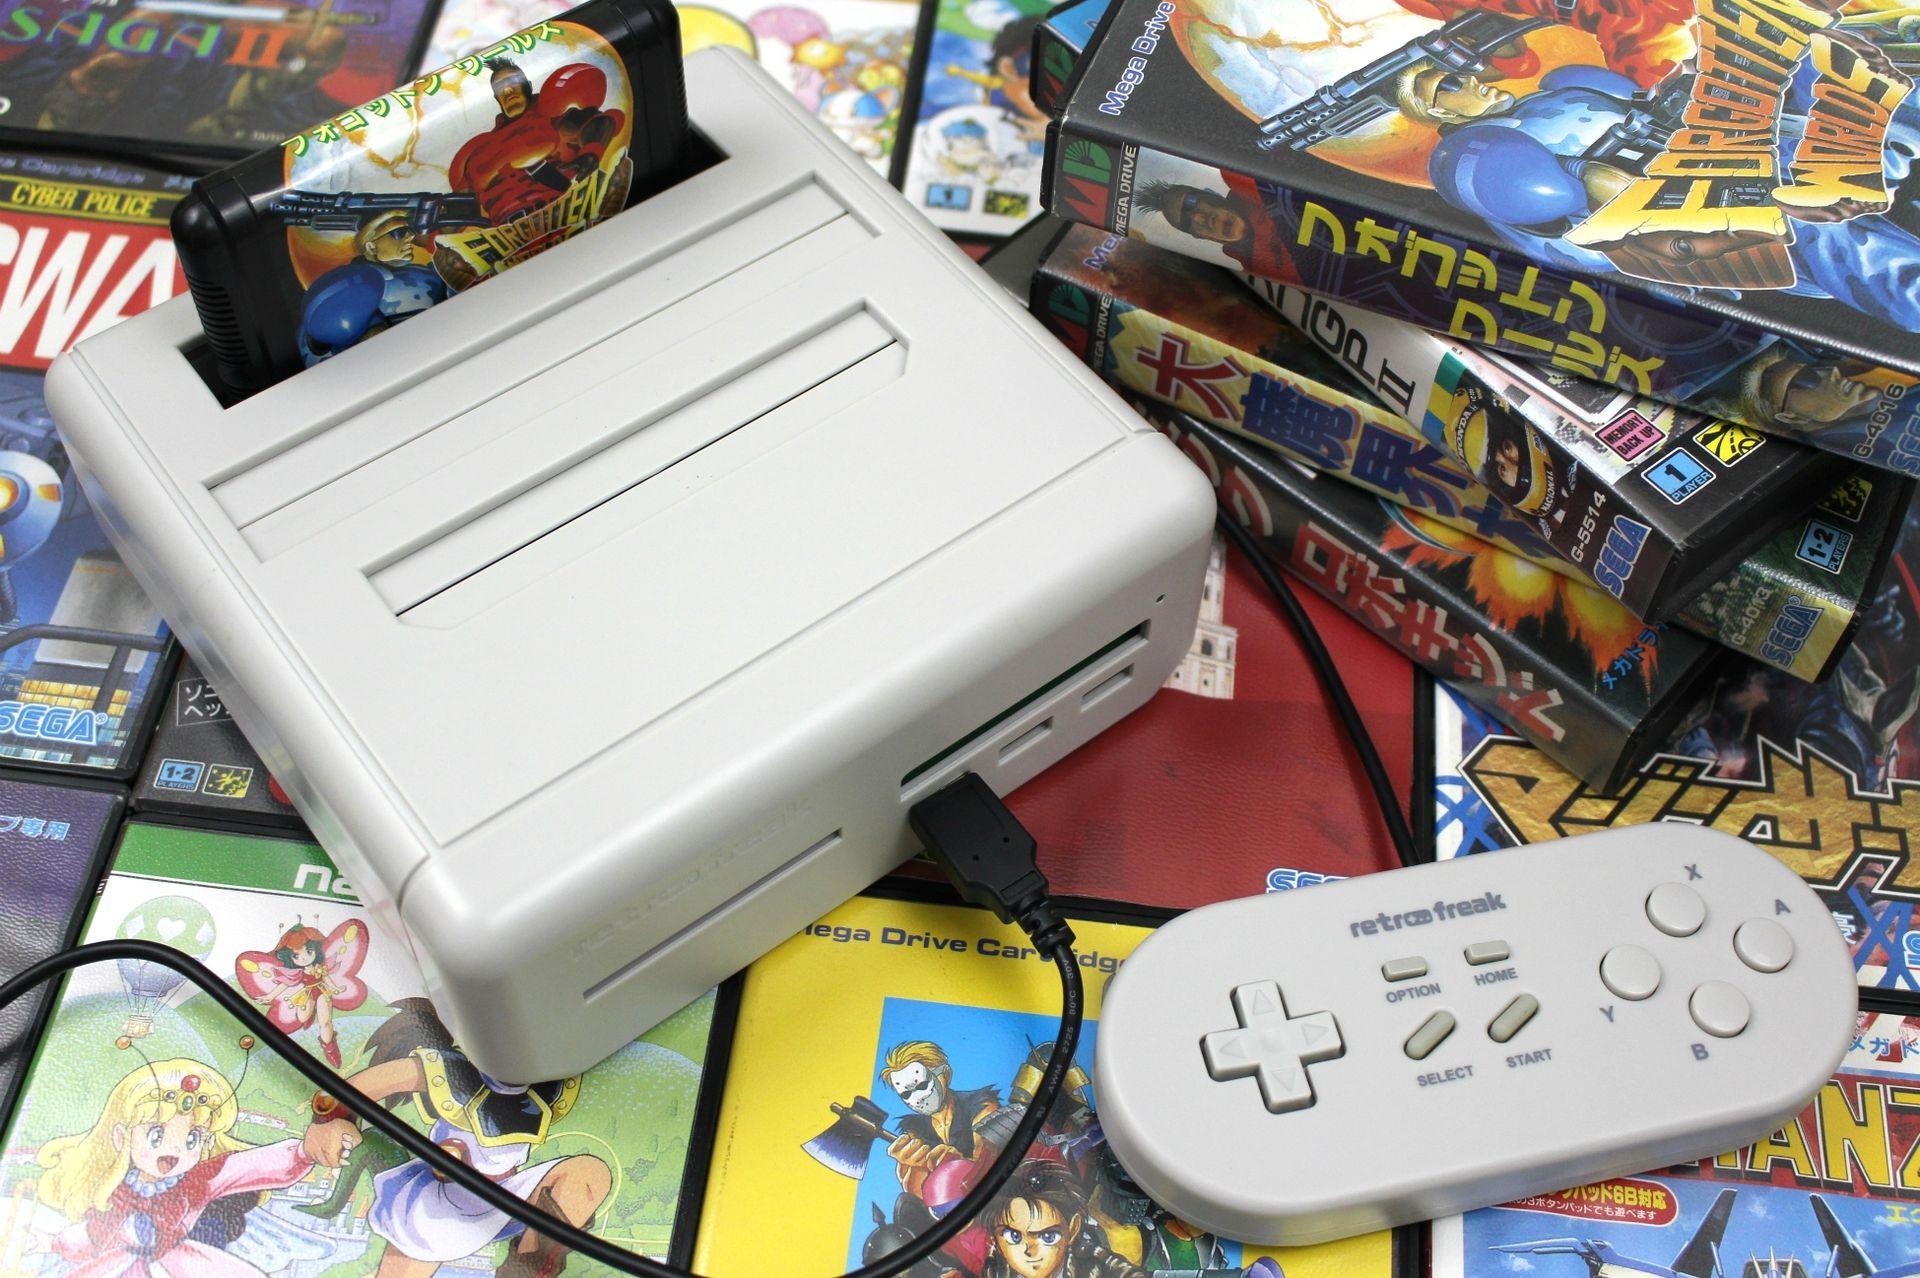 fpga video game console